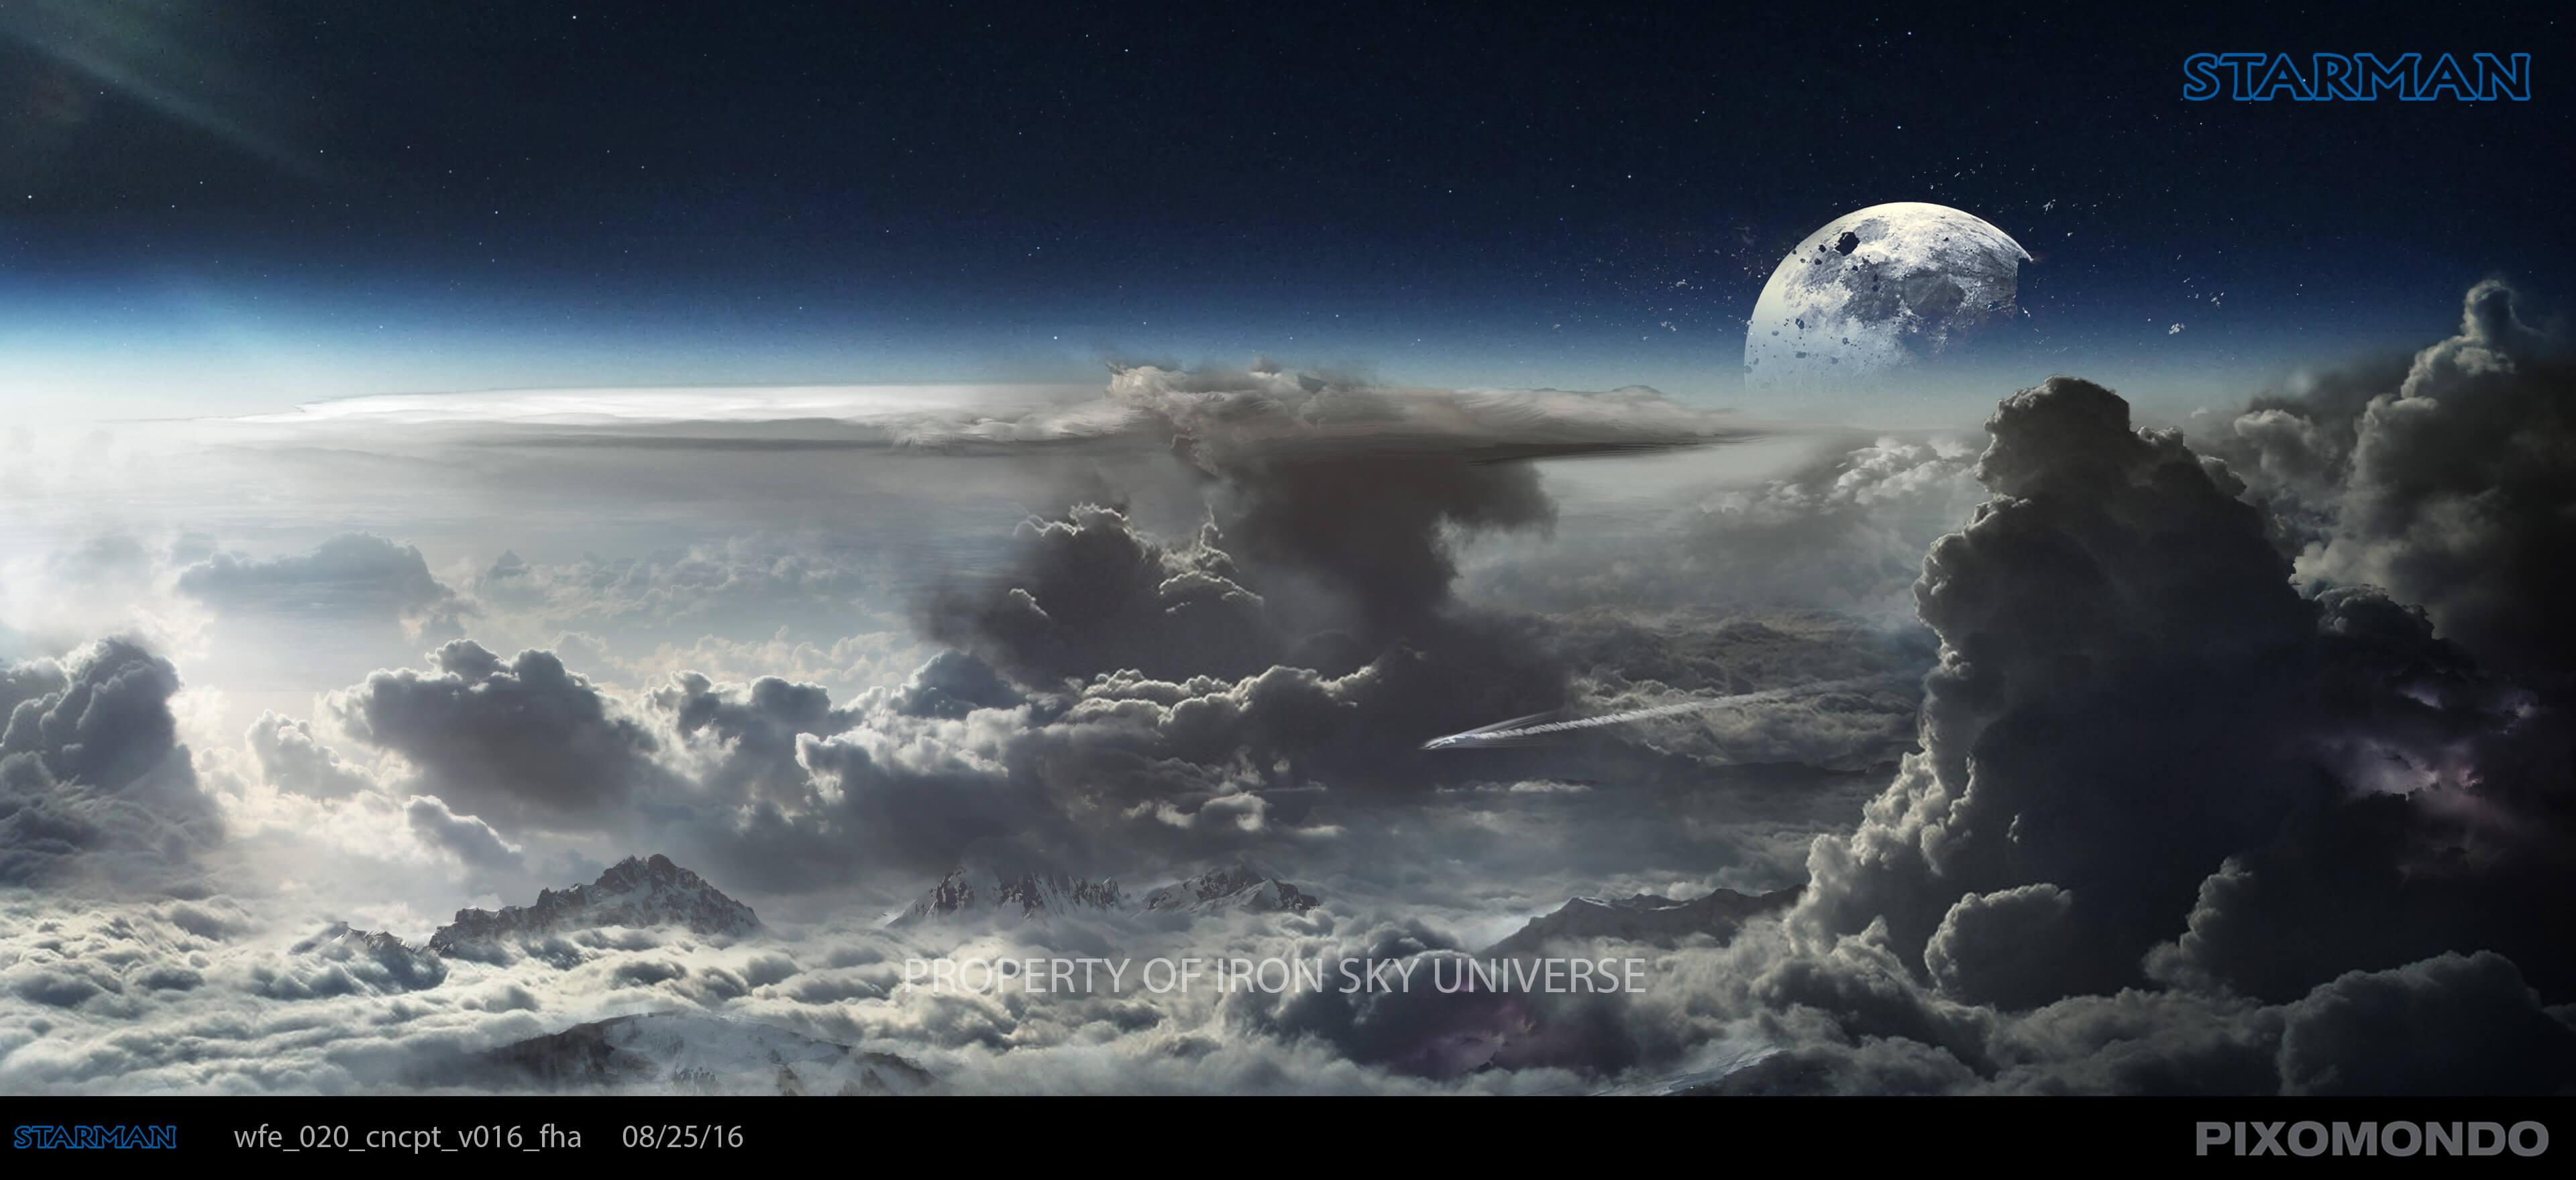 iron-sky-2-concept-art-walkyr-flying-earth-v016-pixomondo-felix-botho-haas.jpg.jpg